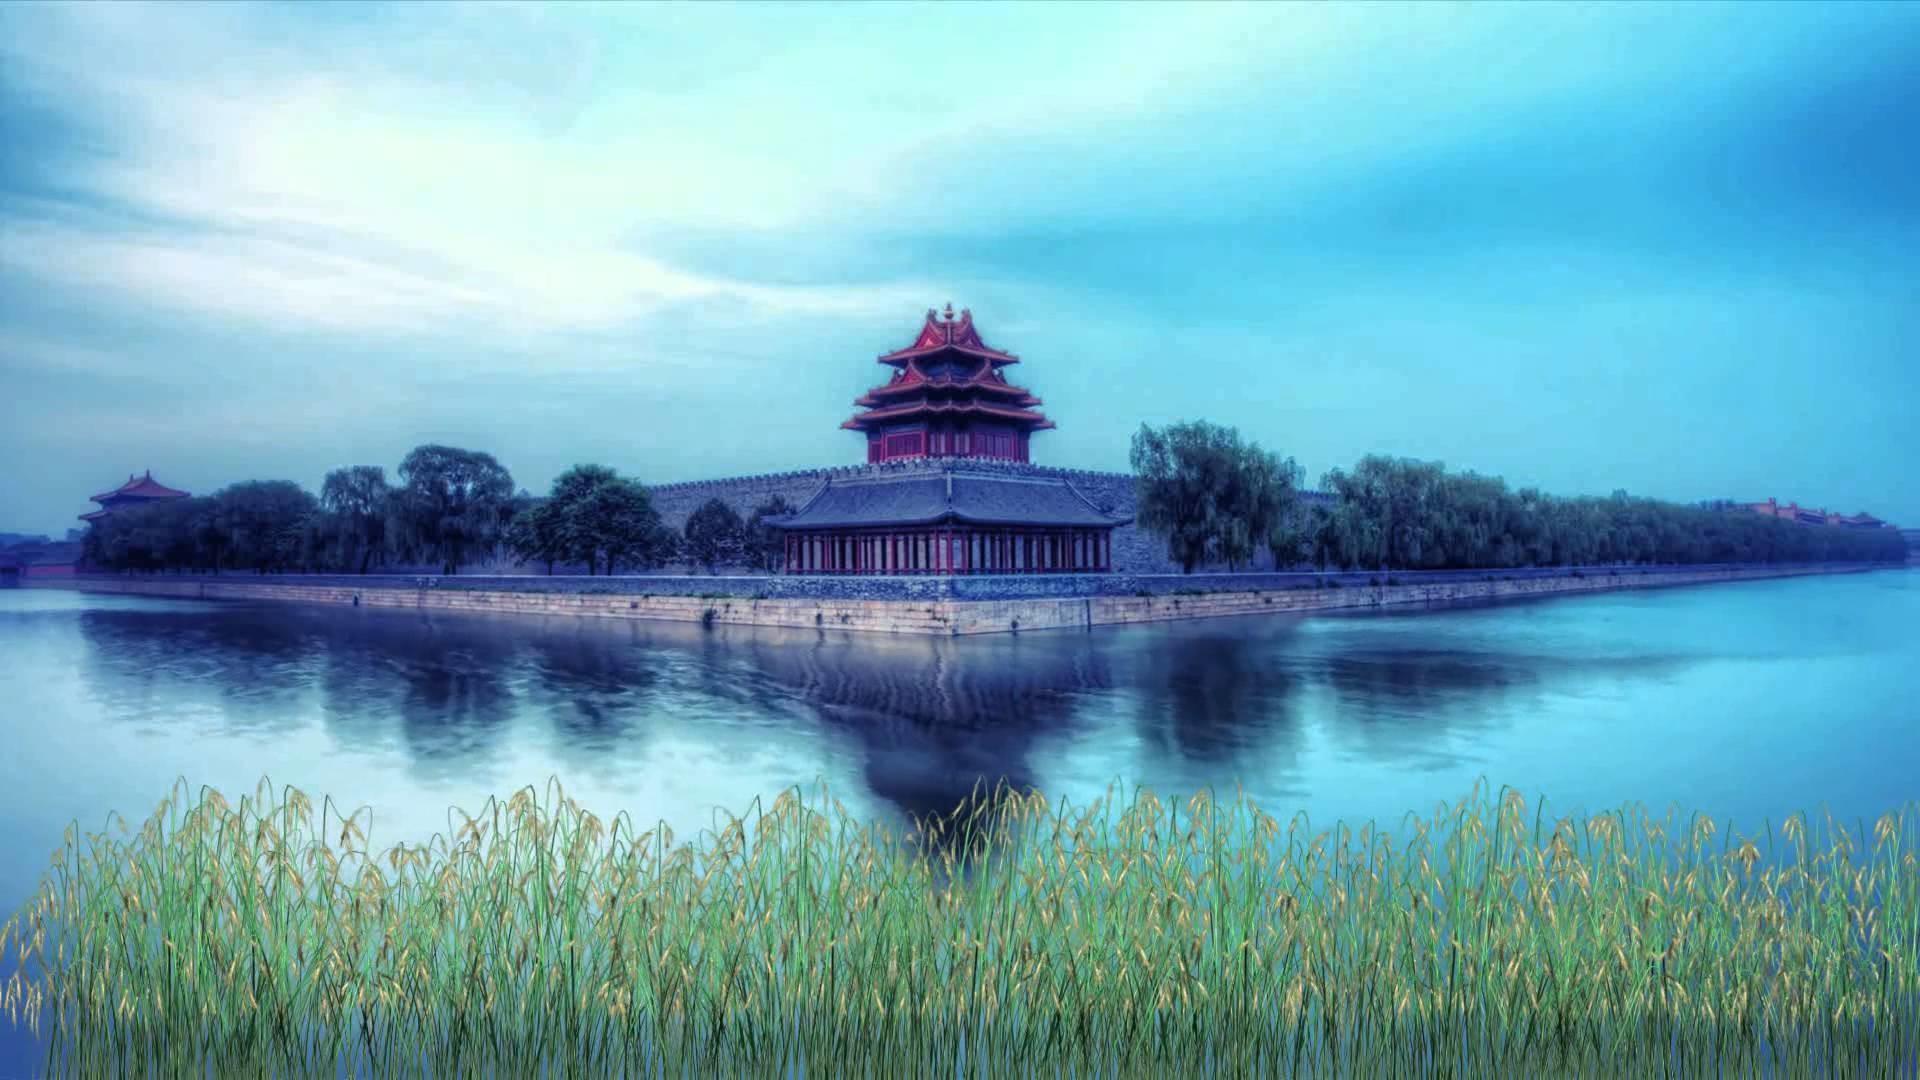 Res: 1920x1080, 0 Asian Landscape Wallpaper BackgroundHD Wallpapers paysages Asian  Landscapes Animated Wallpaper